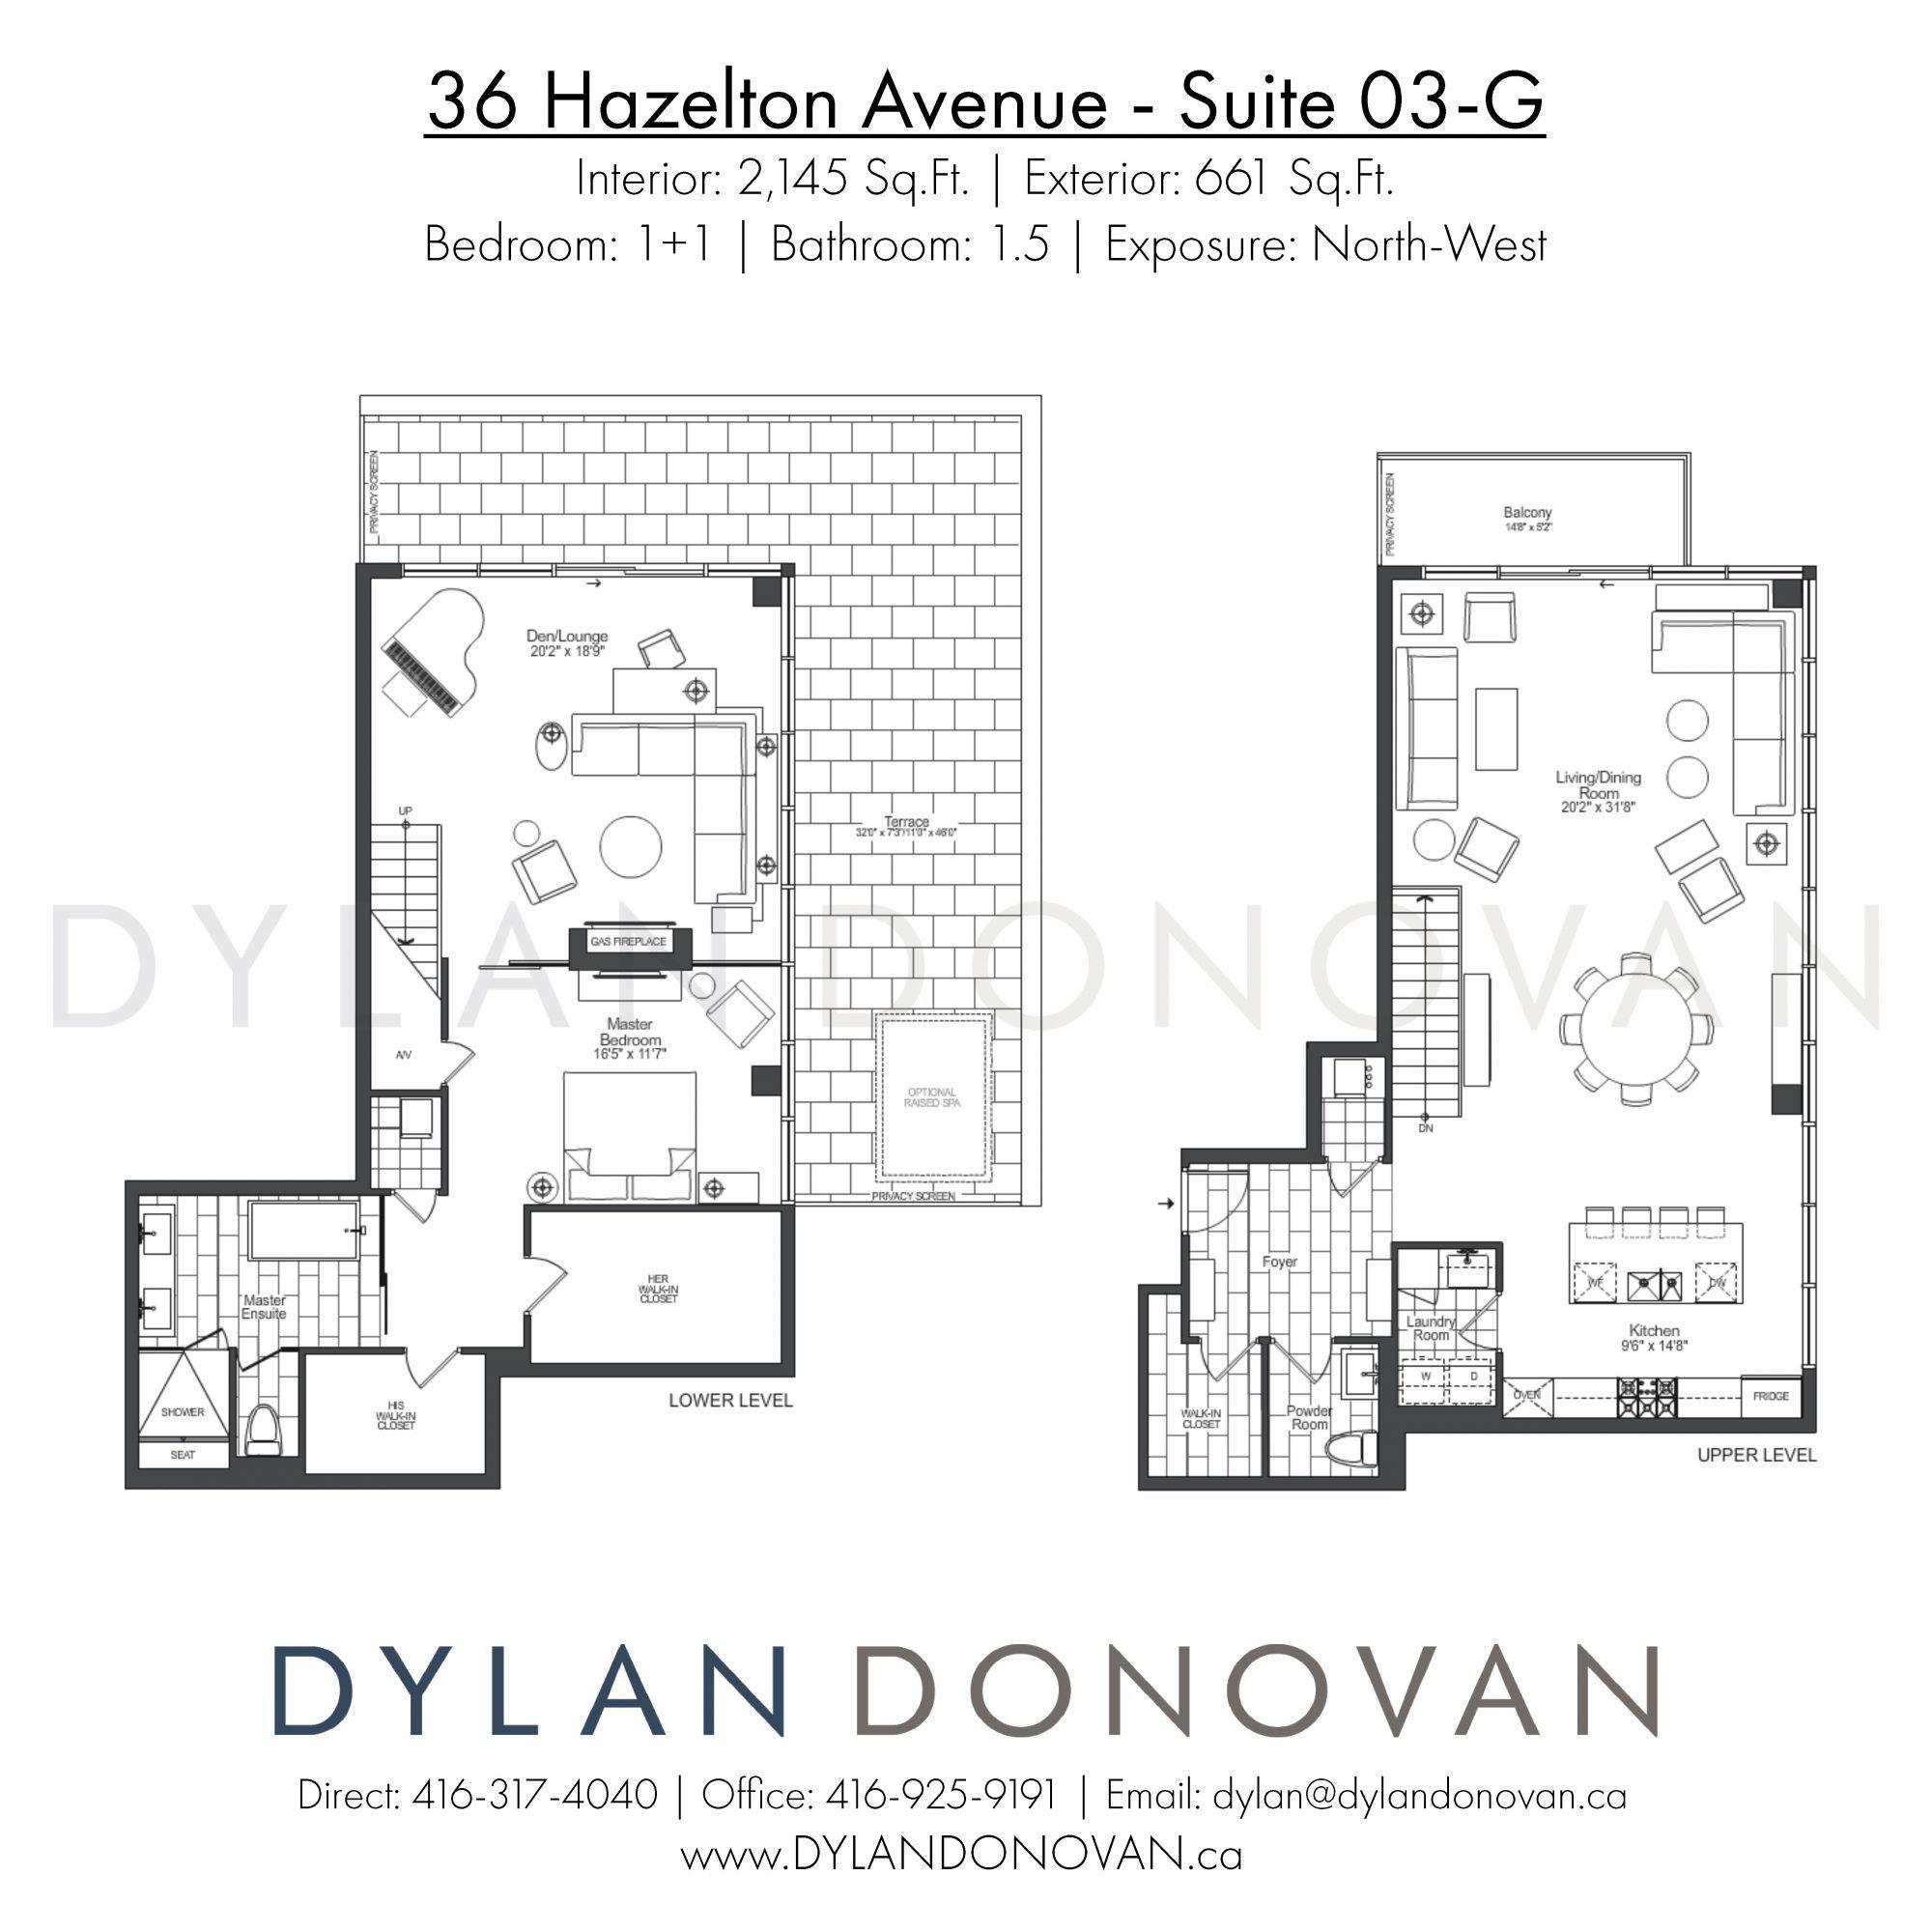 36 Hazelton Avenue Yorkville Floor Plans Luxury Condo Flooring Sale